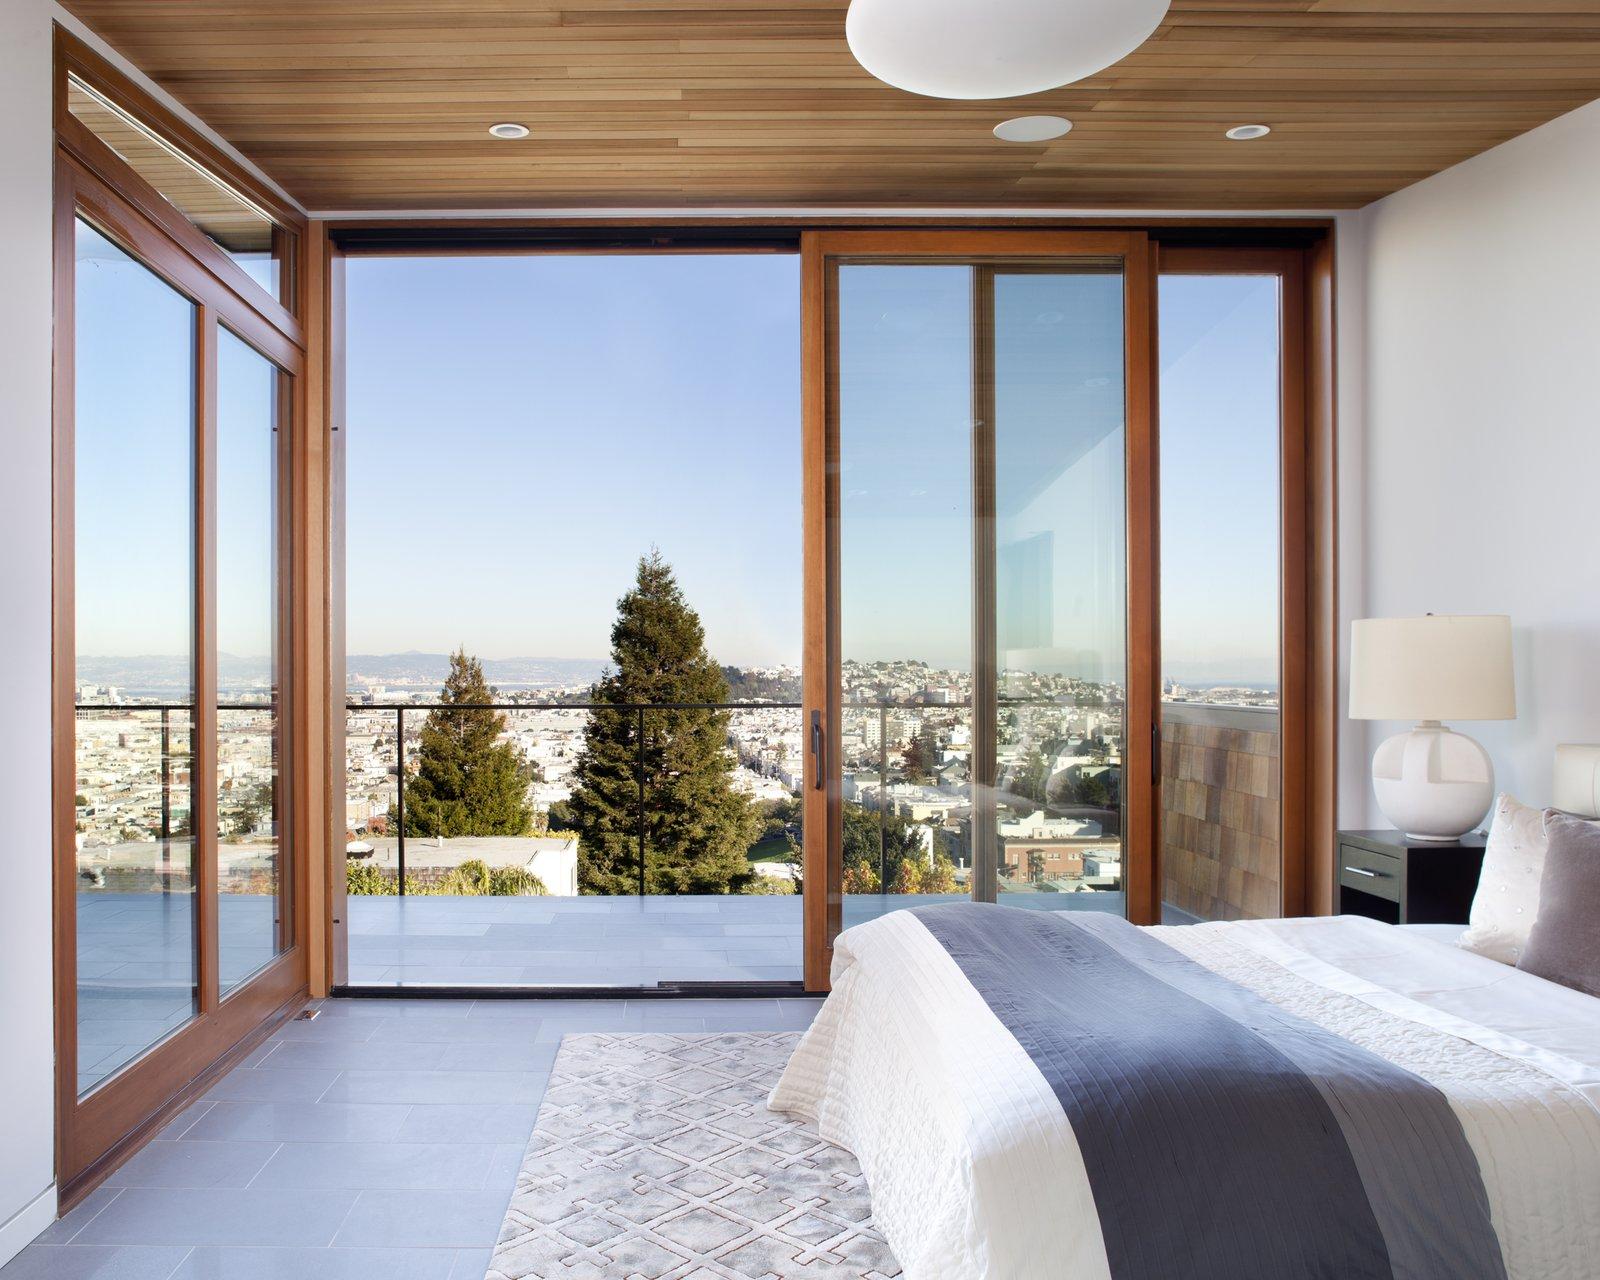 cedar wood ceiling quantum sliding doors porcelain tile flooring master bedroom